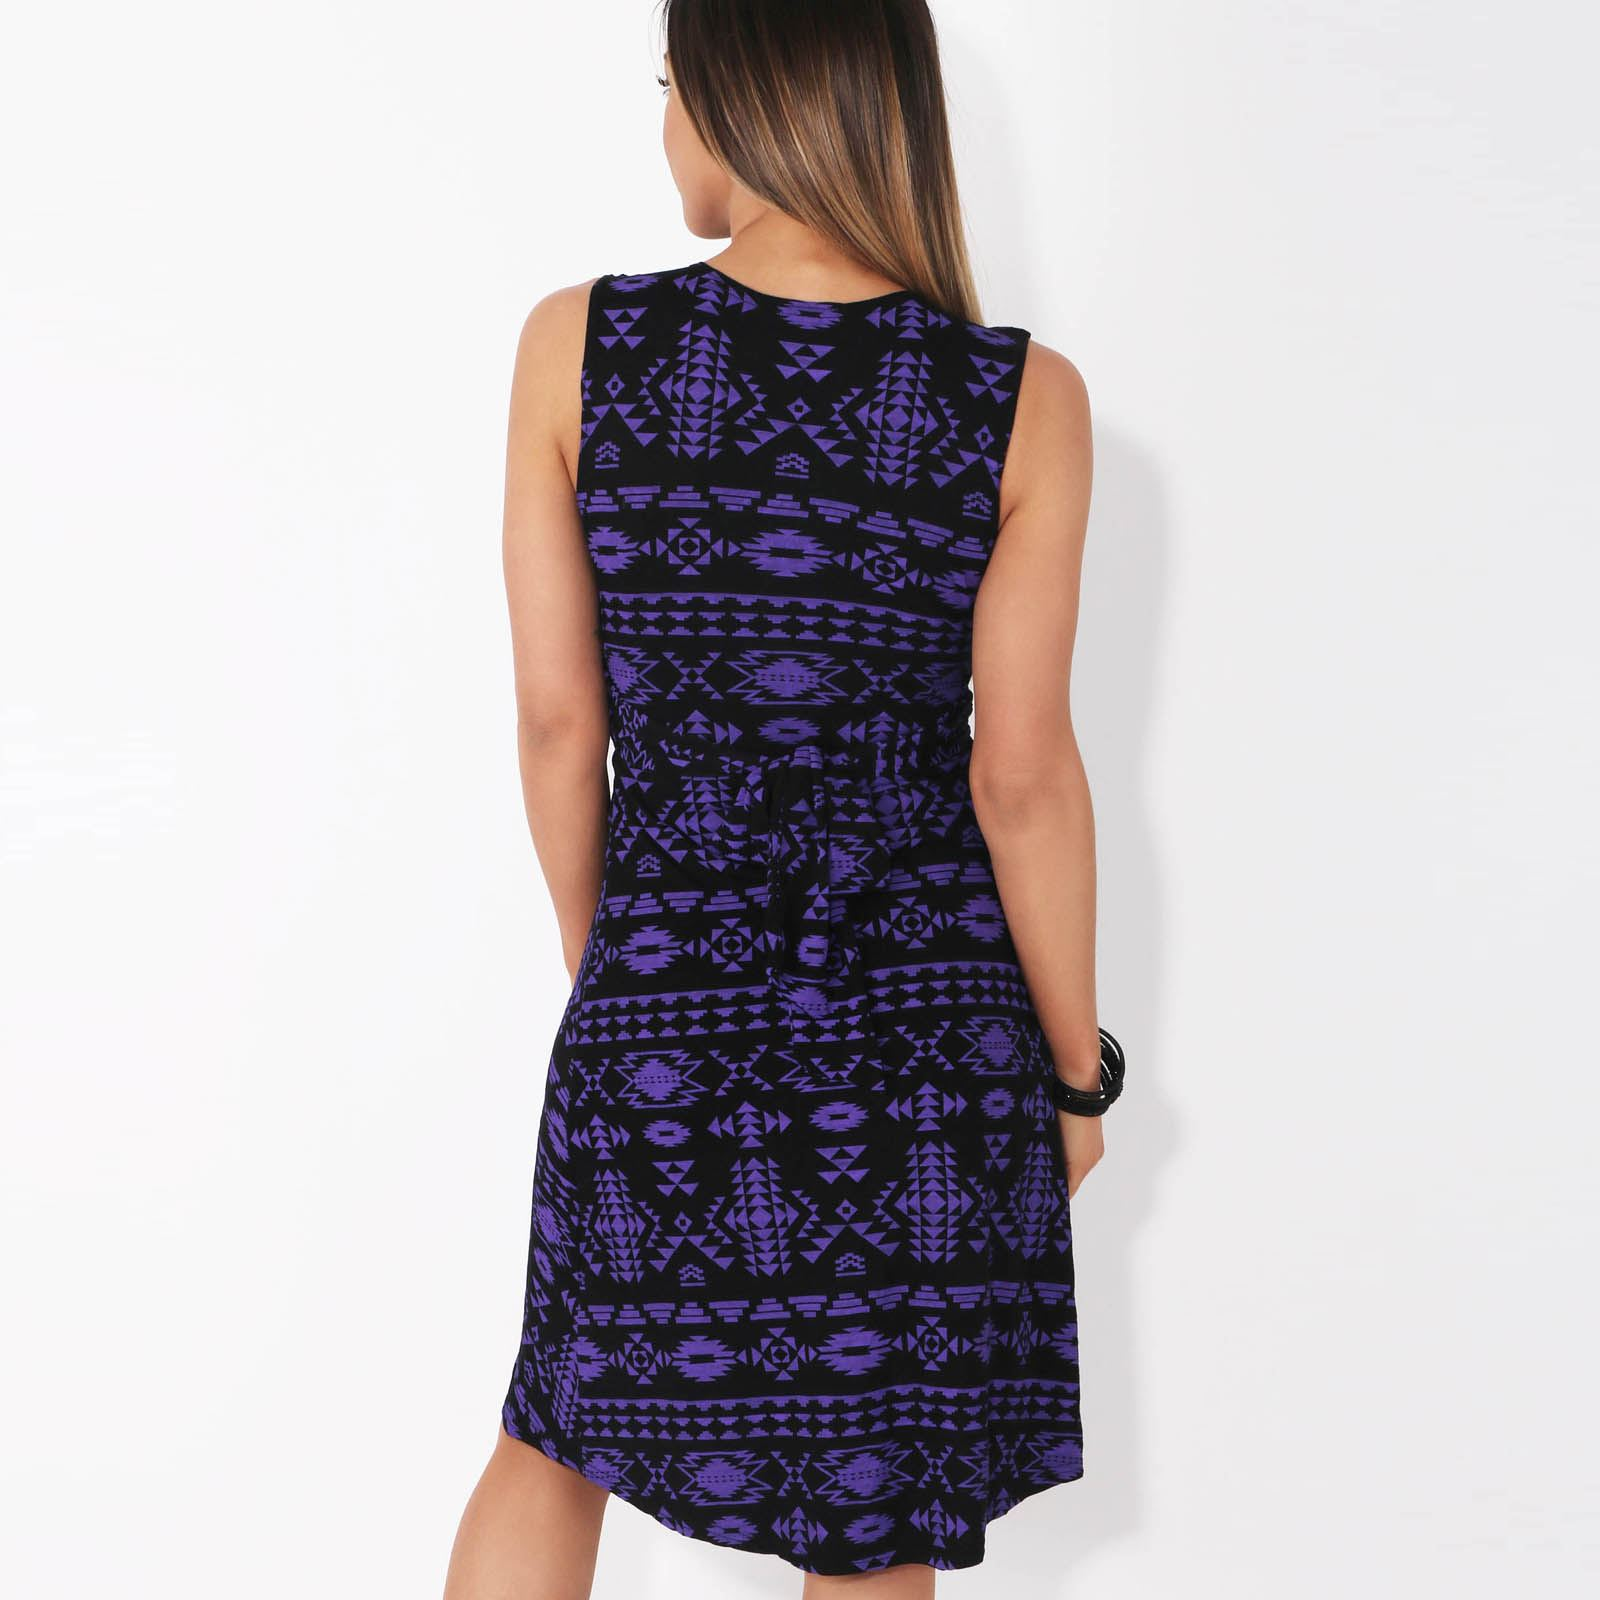 Womens-V-Neck-Mini-Dress-Small-Sizes-Short-Skirt-Tribal-Print-Front-Knot-Party thumbnail 12